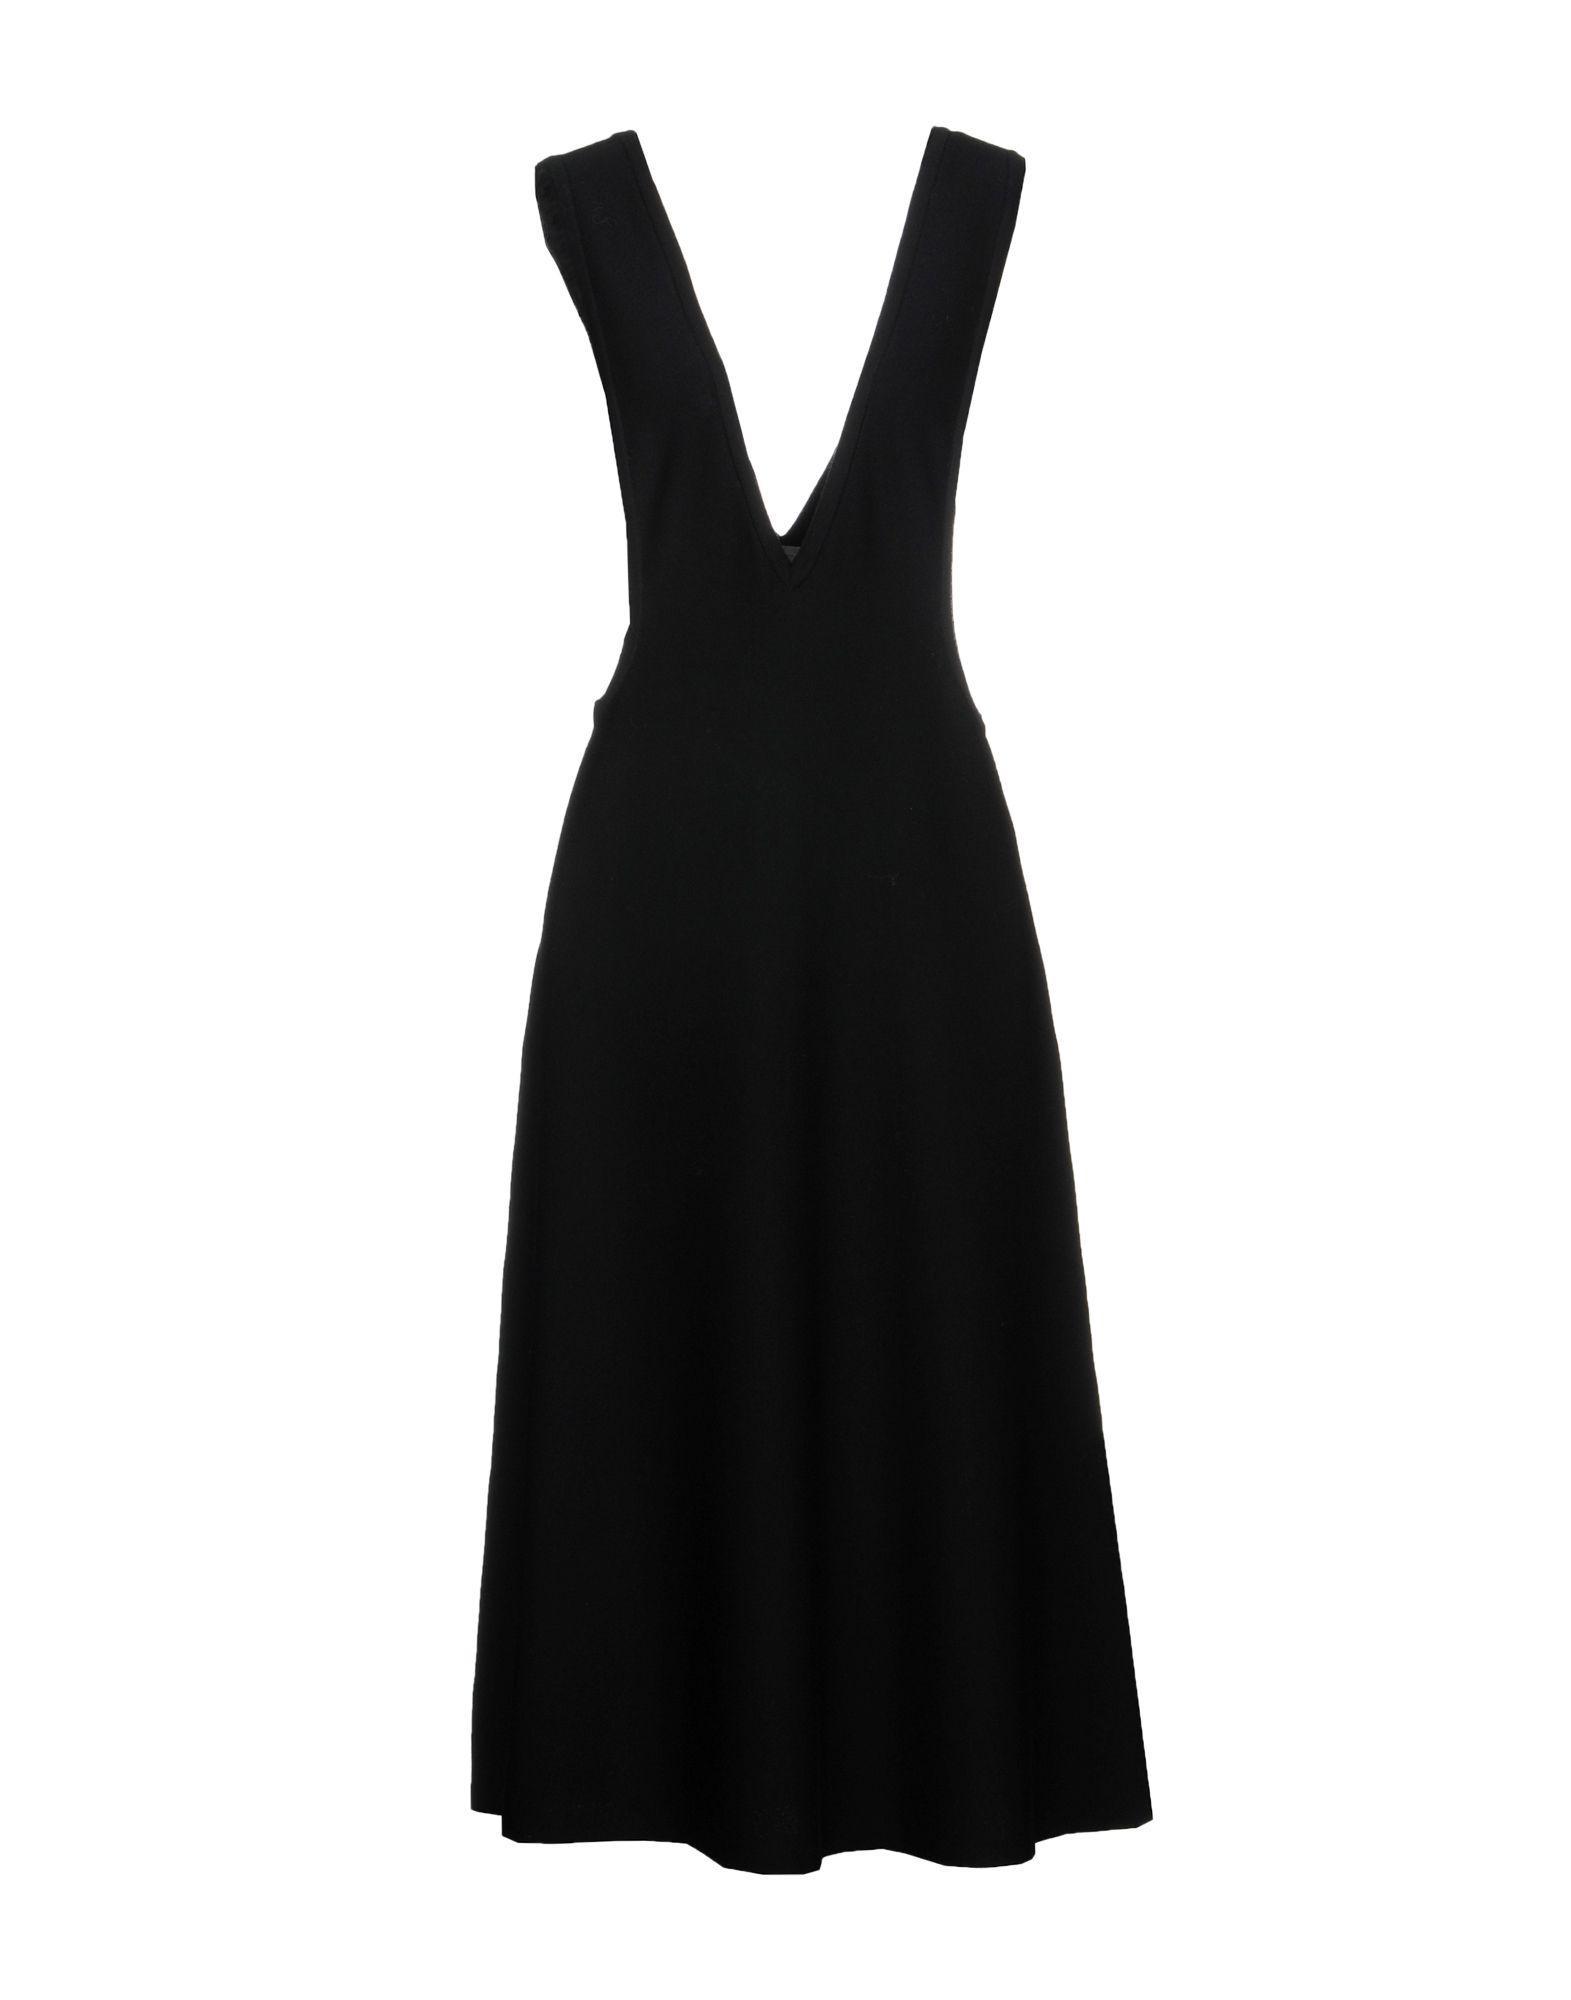 Mrz Knee-length Dress In Black